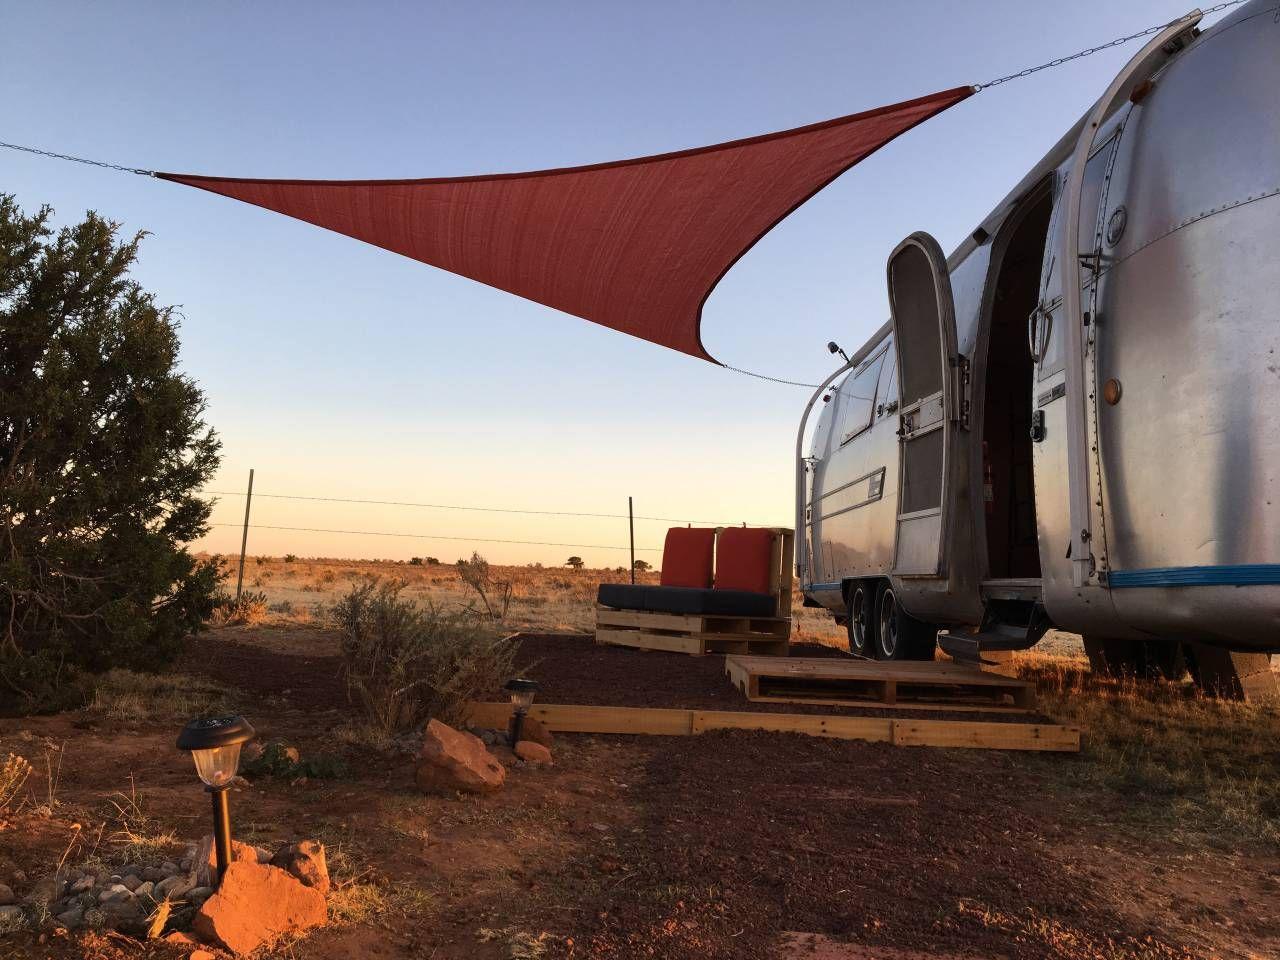 Airstream basecamp near Grand Canyon, Arizona